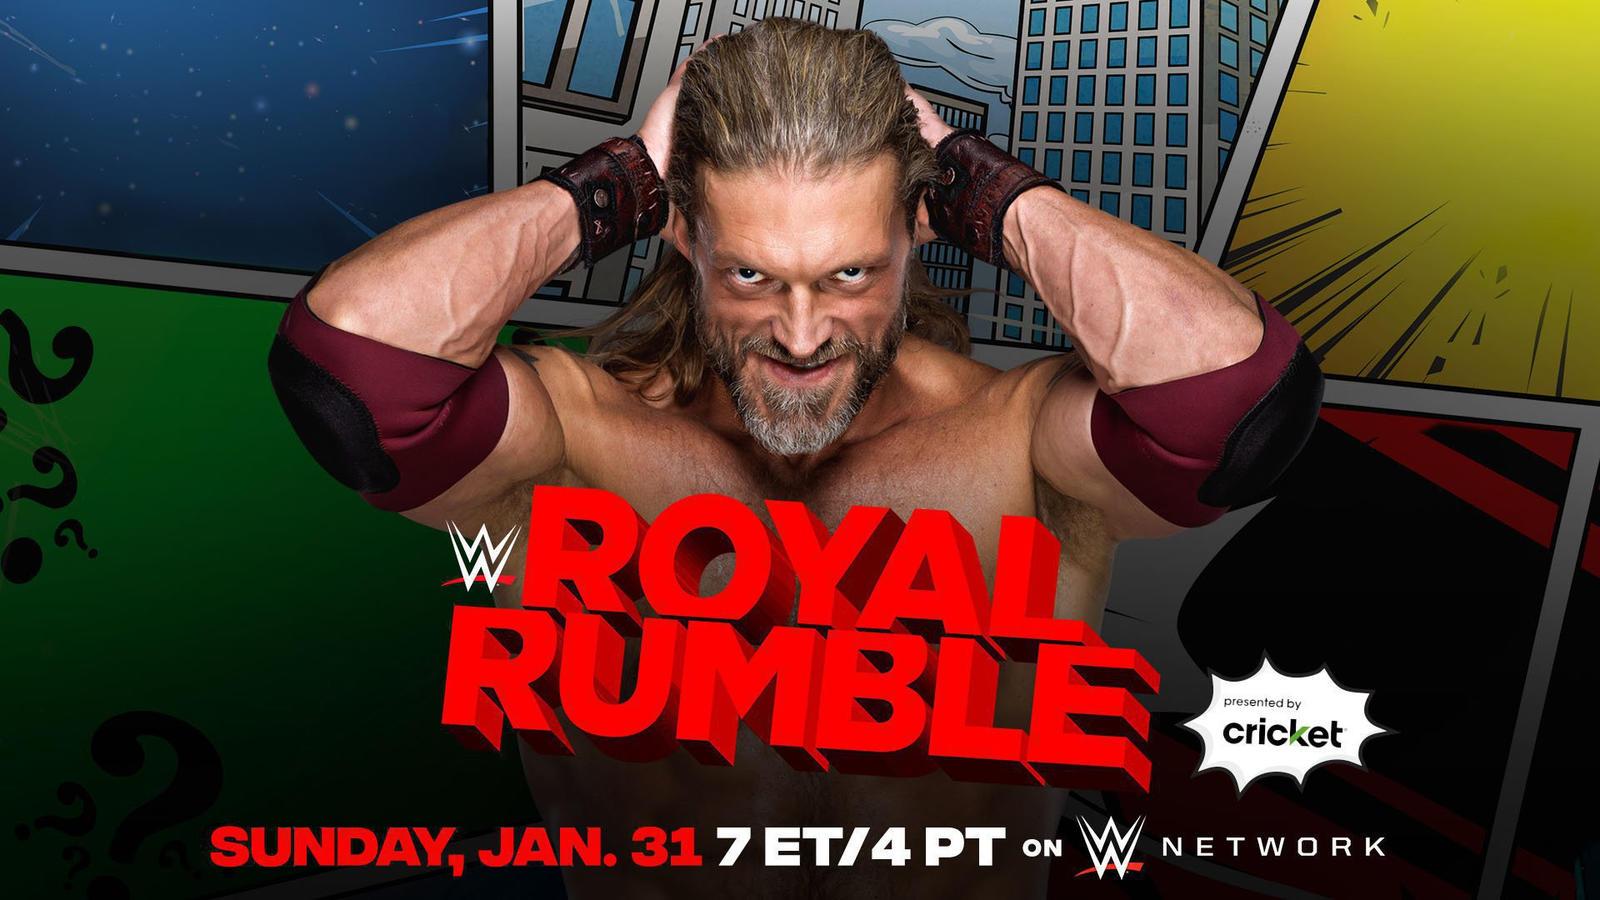 Royal Rumble 2021: WWE Announces Edge's Return; Title Match & More 1